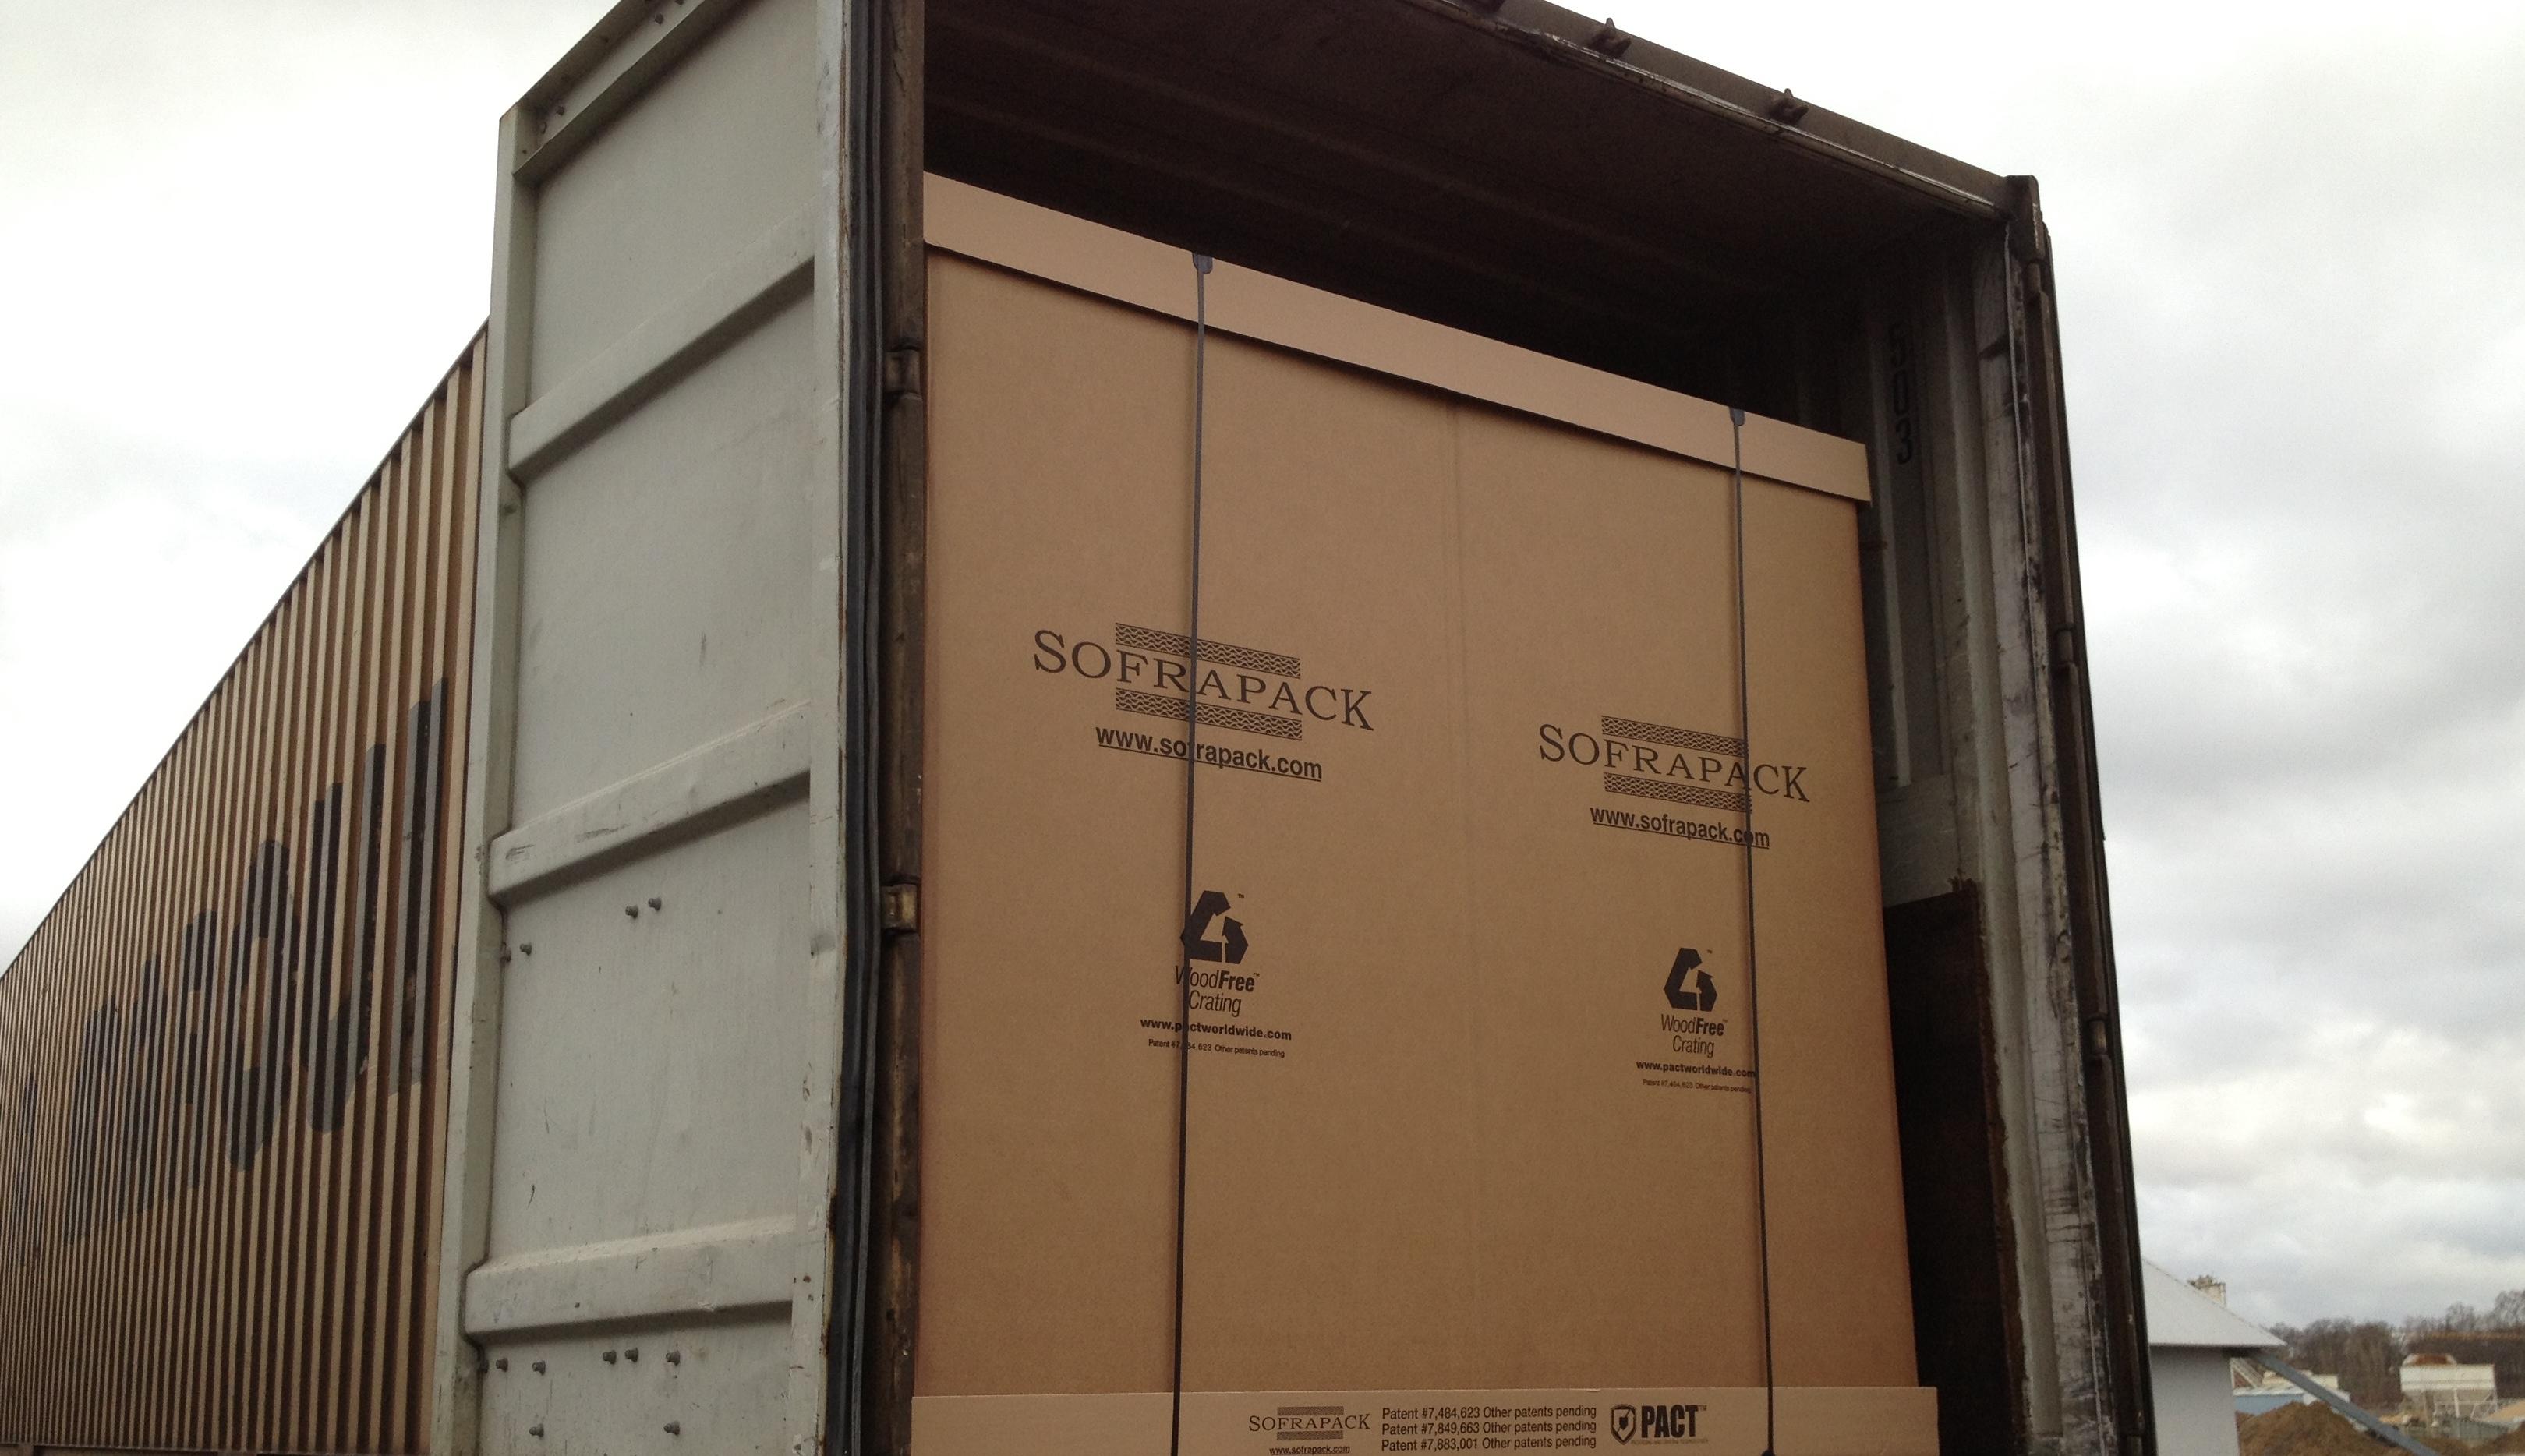 SOFRAPACK - Caisse palette transport maritime